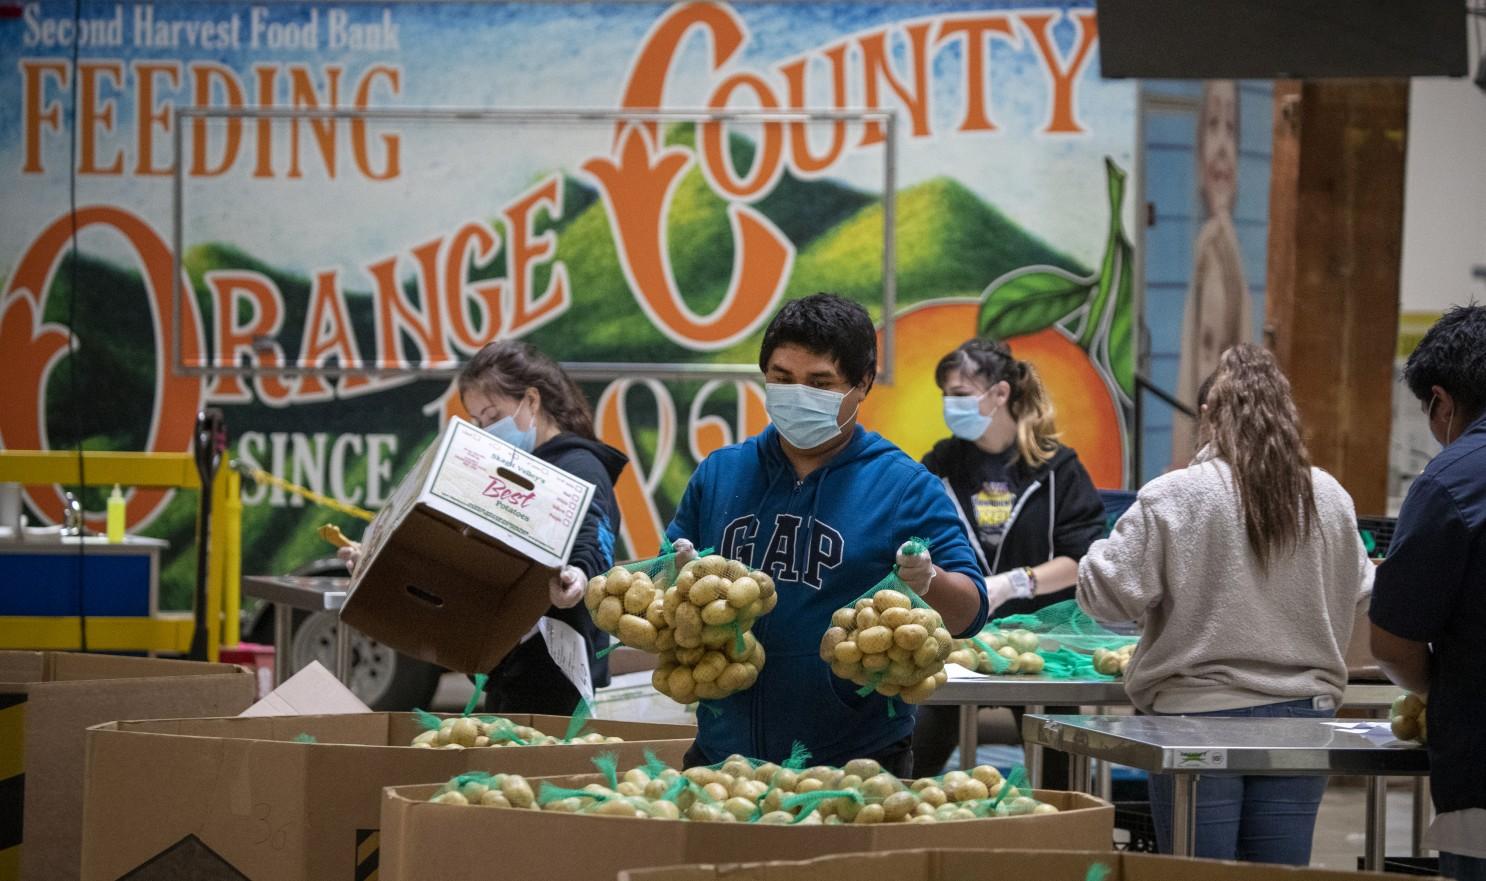 Coronavirus: Orange County food bank steps up amid shortages - Los ...